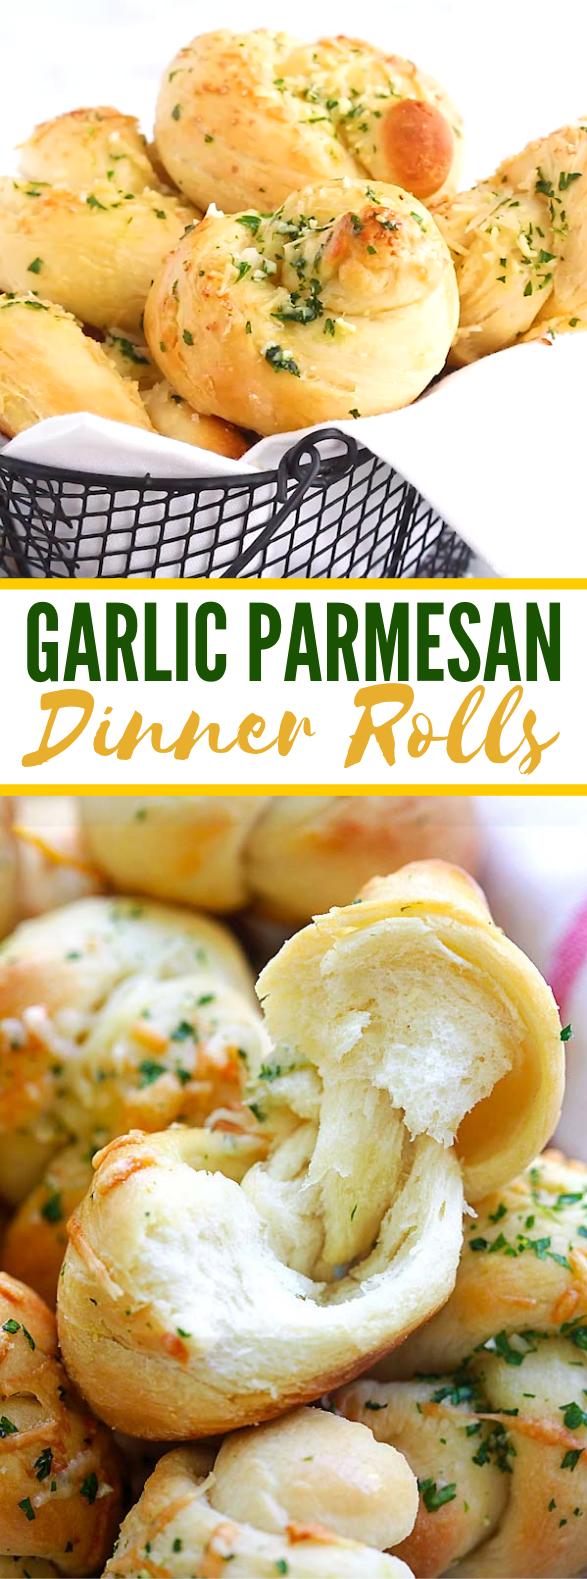 Garlic Parmesan Dinner Rolls #dough #dinnerrecipe